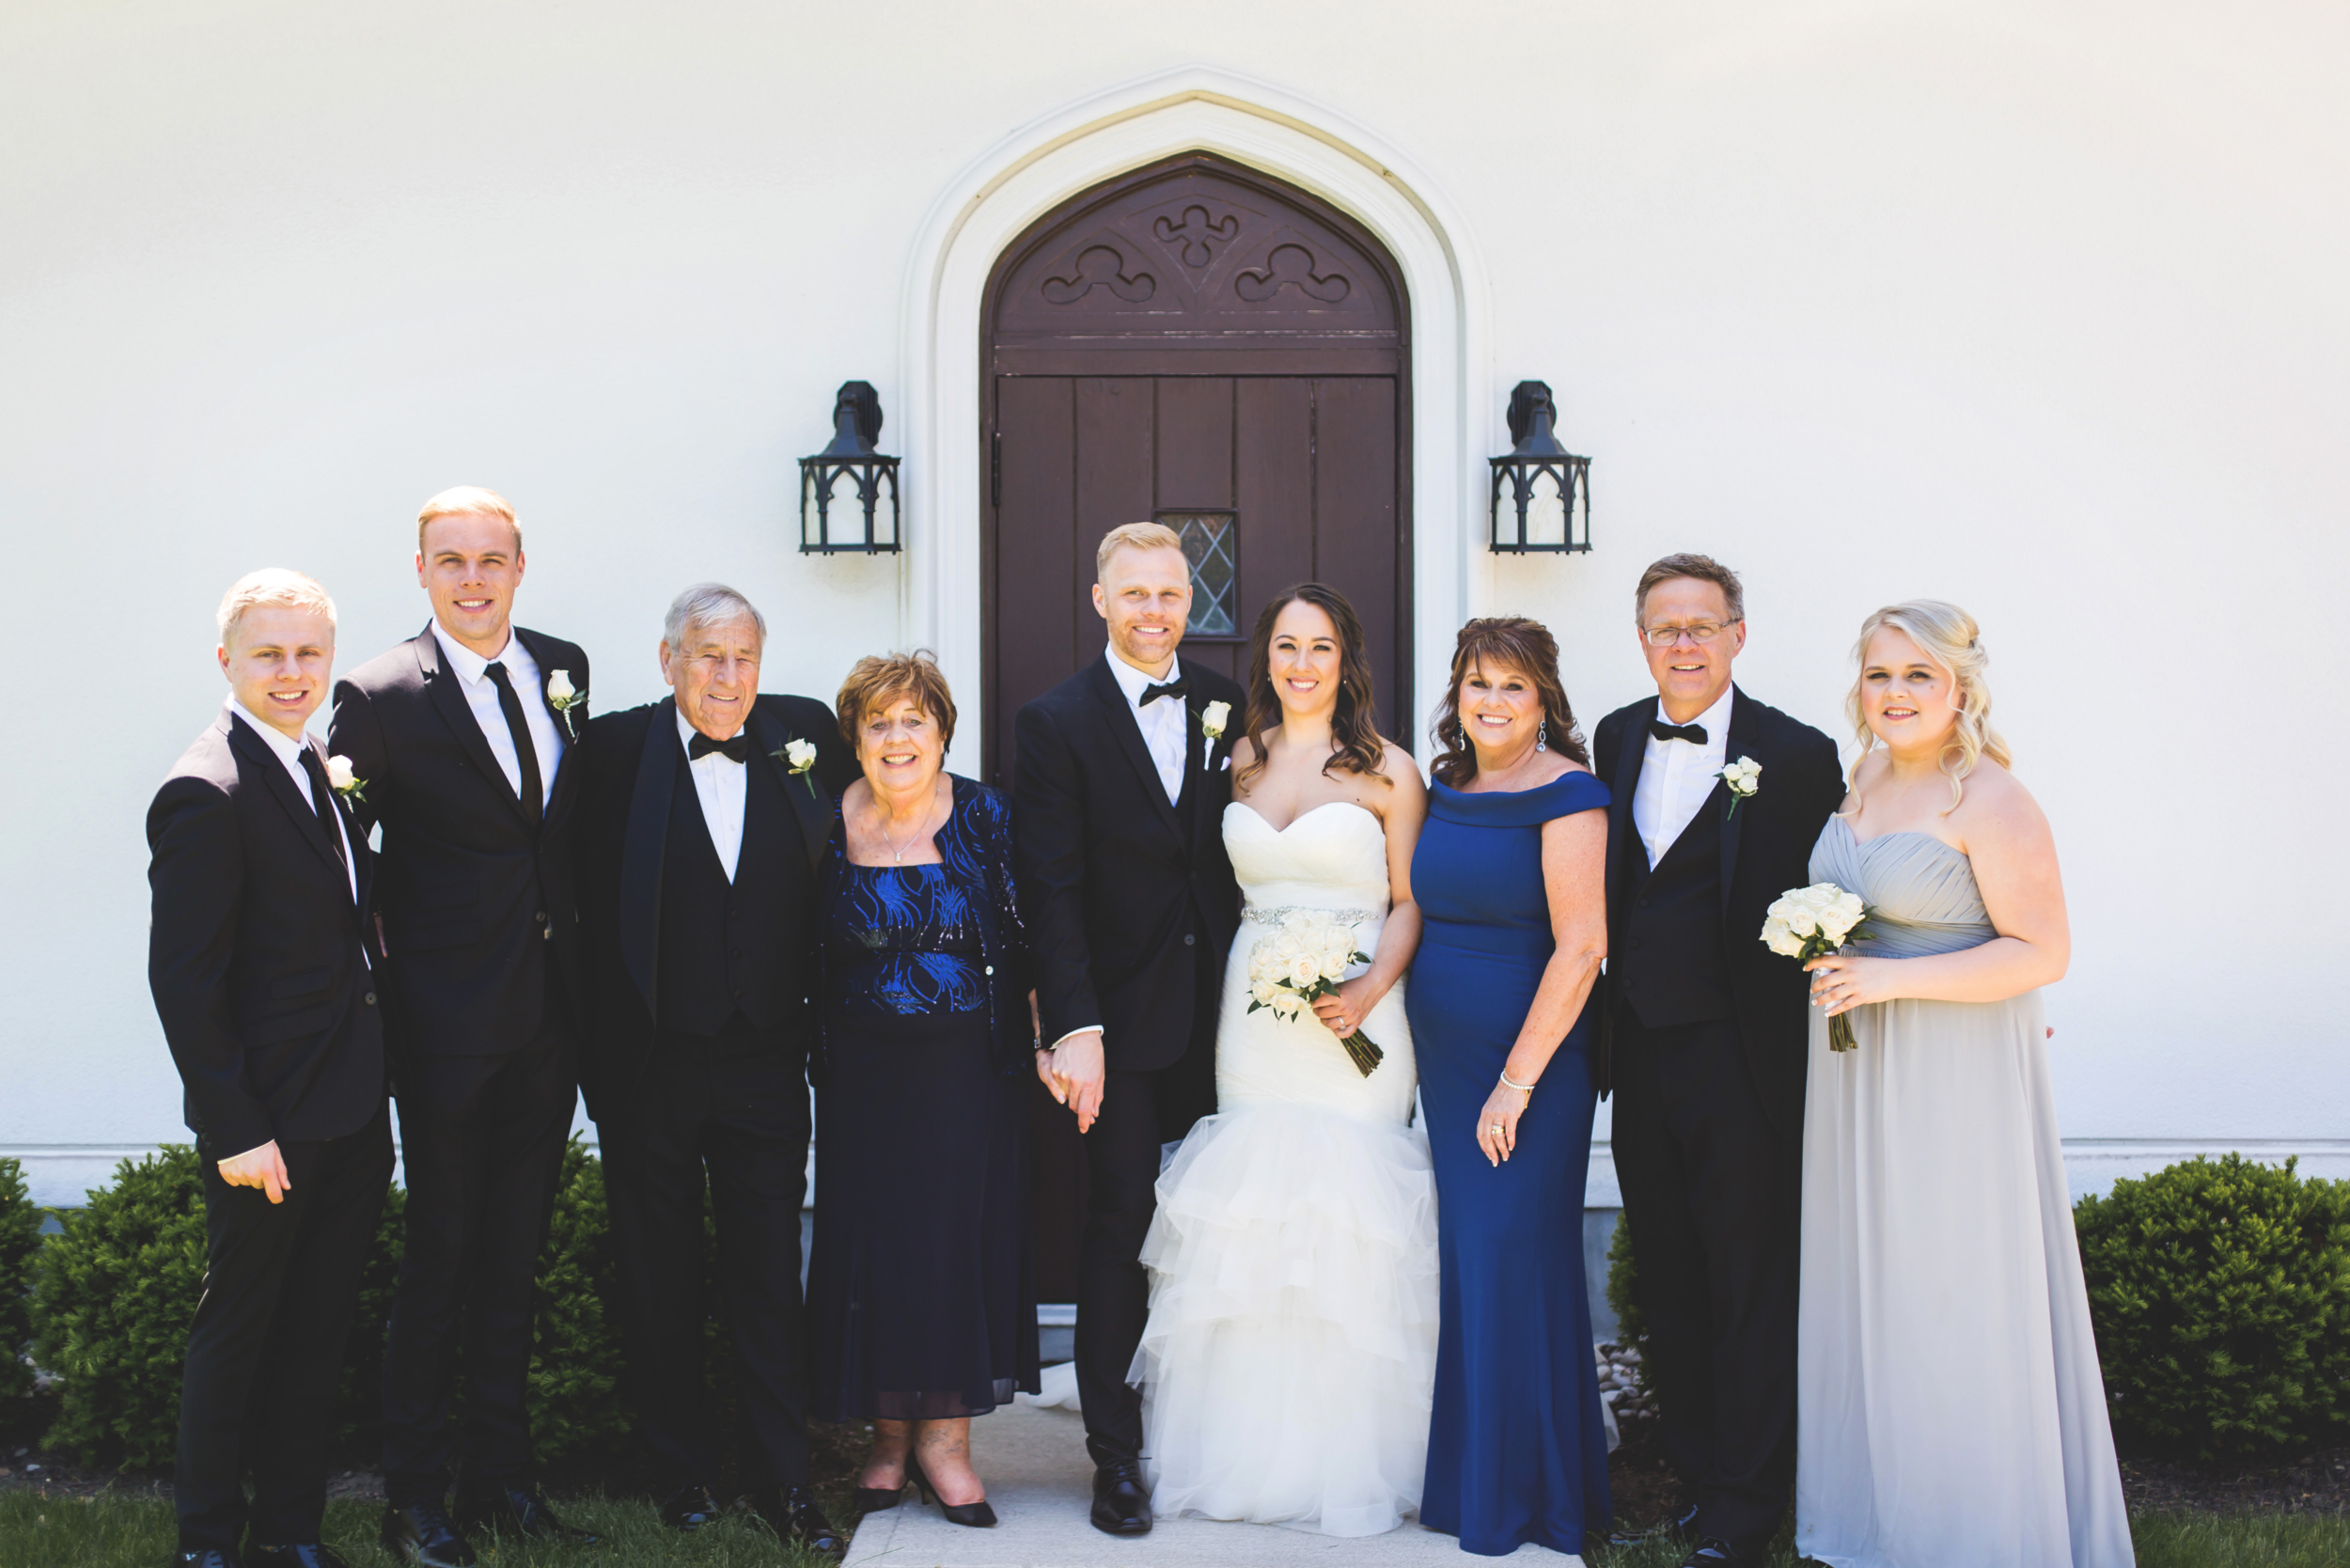 Wedding-Harbour-Banquet-Center-Oakville-Photographer-Wedding-Hamilton-Saint-James-Espresso-Downtown-HamOnt-GTA-Niagara-Toronto-Moments-by-Lauren-Photography-Photo-Image-21.png